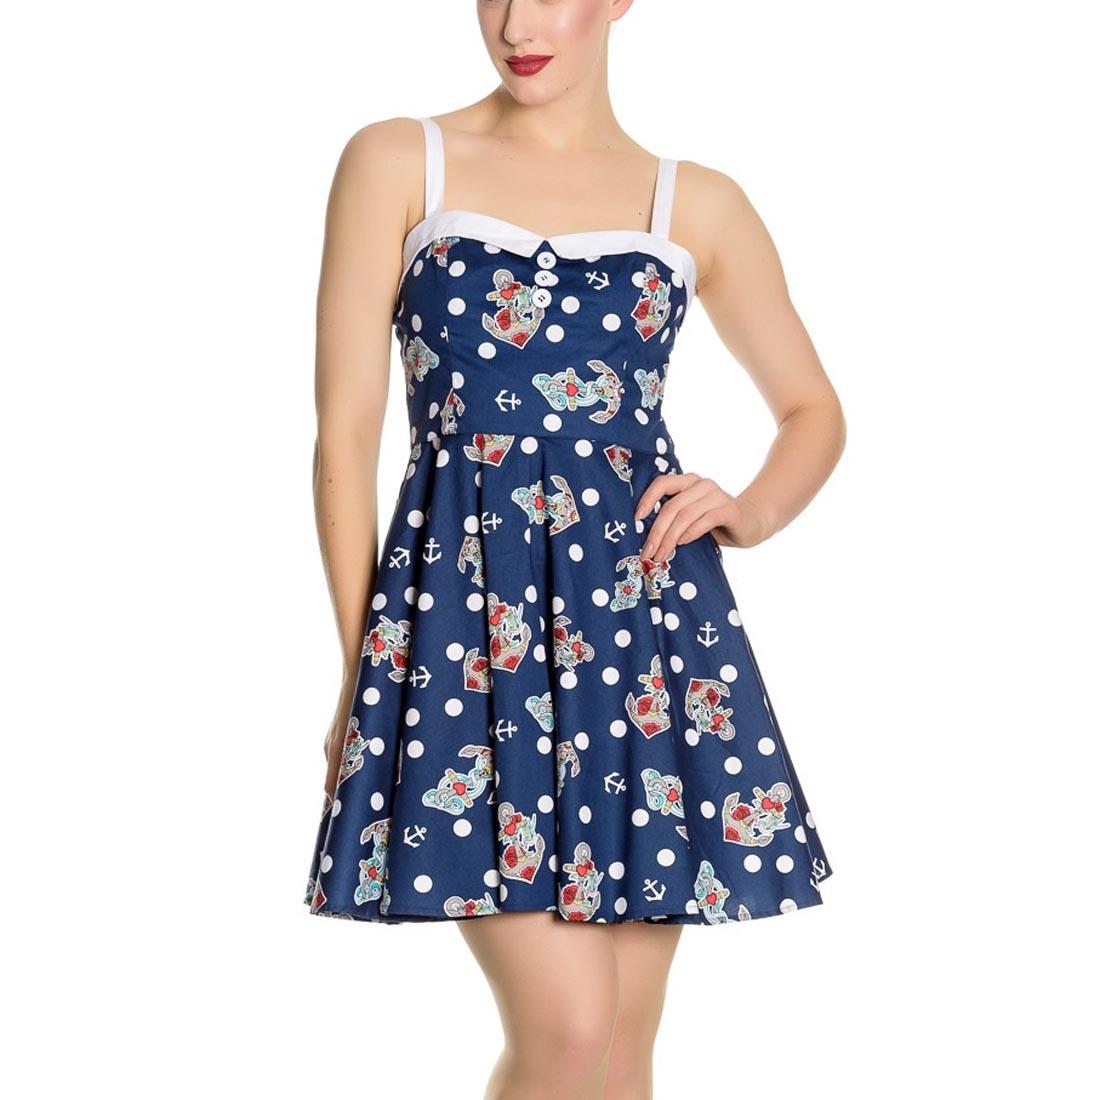 Hell-Bunny-Navy-Blue-50s-Nautical-Mini-Dress-OCEANA-Polka-Dot-All-Sizes thumbnail 11